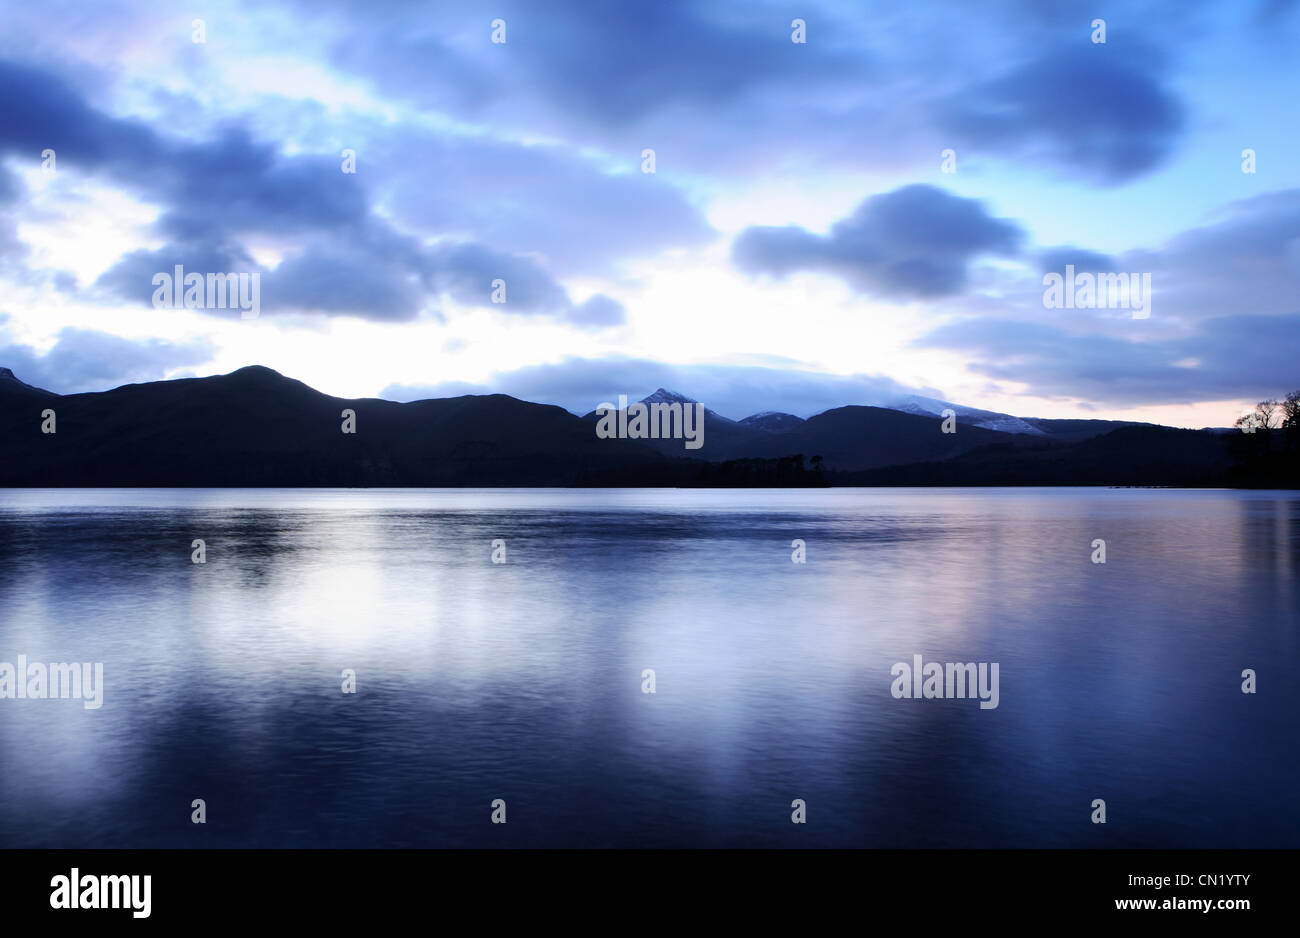 Lake at dusk, Lake District, Cumbria, England, UK - Stock Image